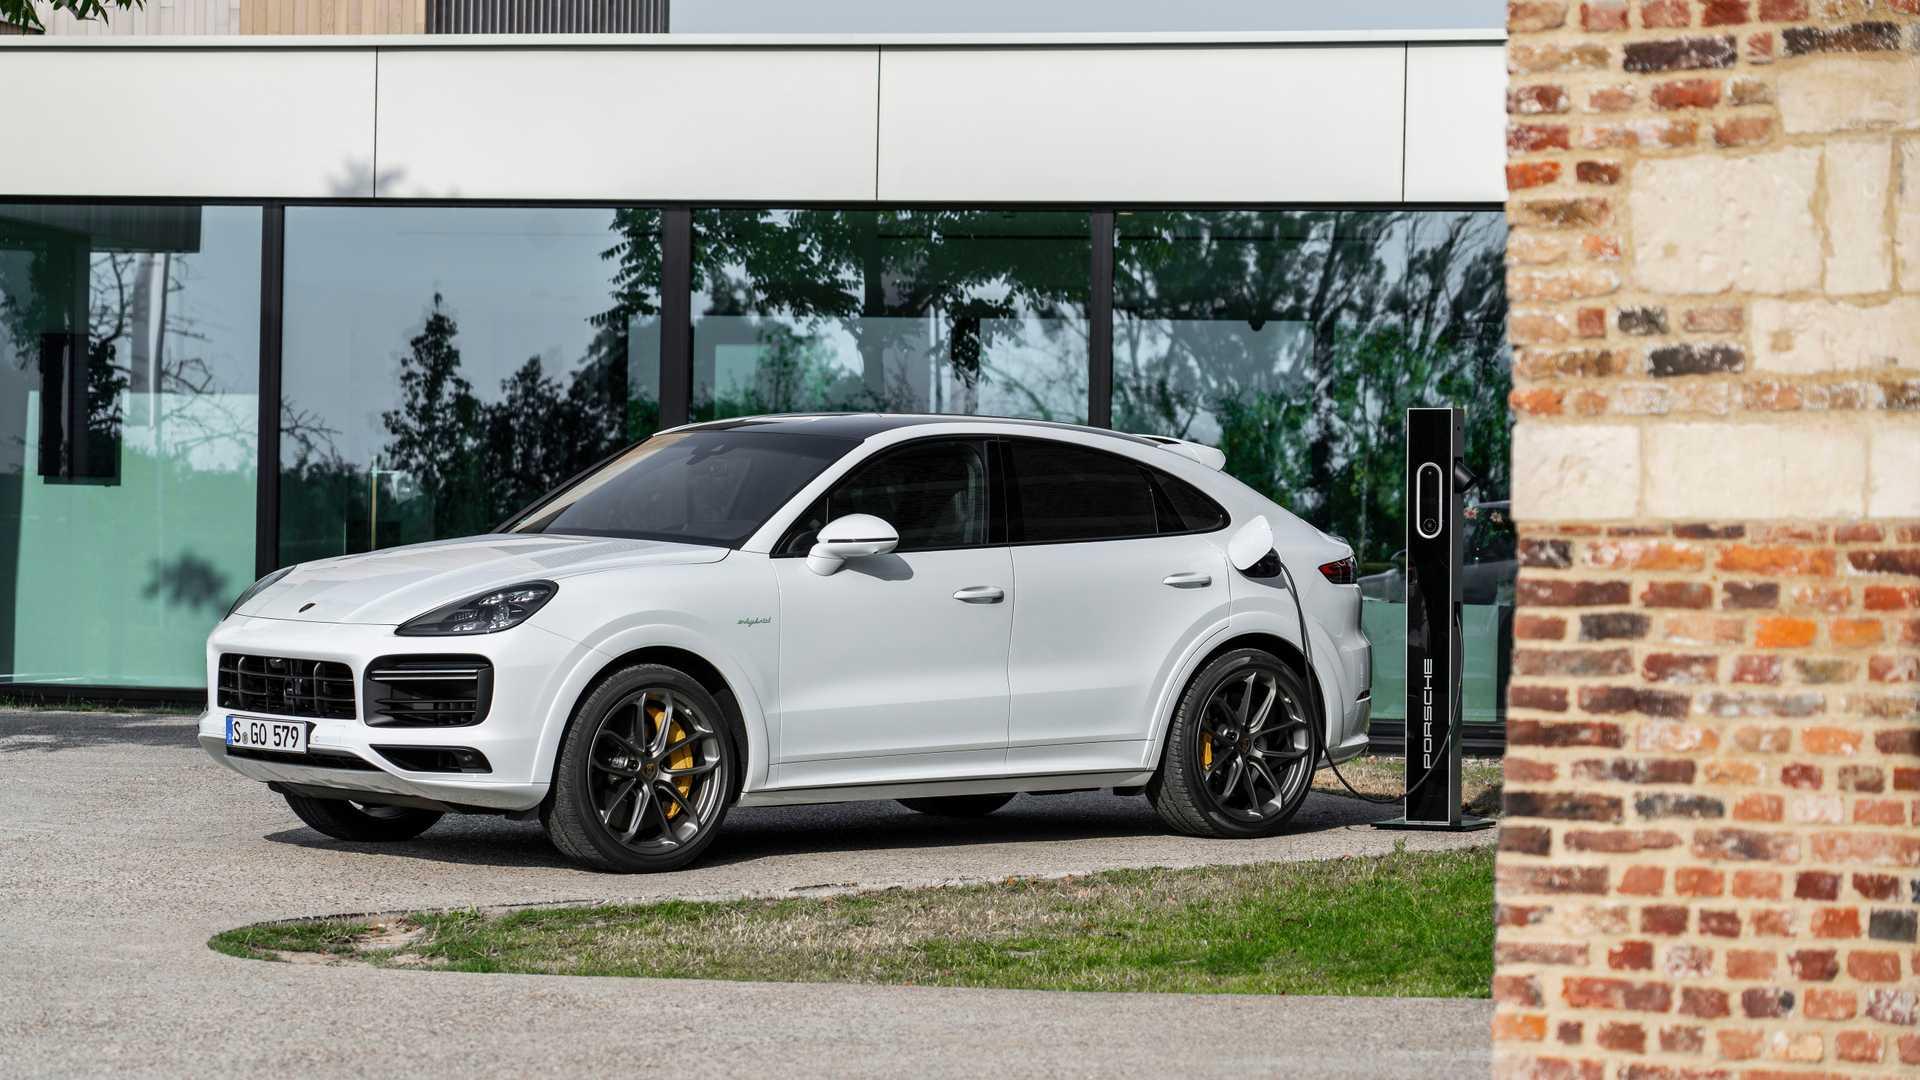 2020-porsche-cayenne-turbo-s-e-hybrid-coupe-turbo-s-e-hybrid-and-coupe-e-hybrid-4